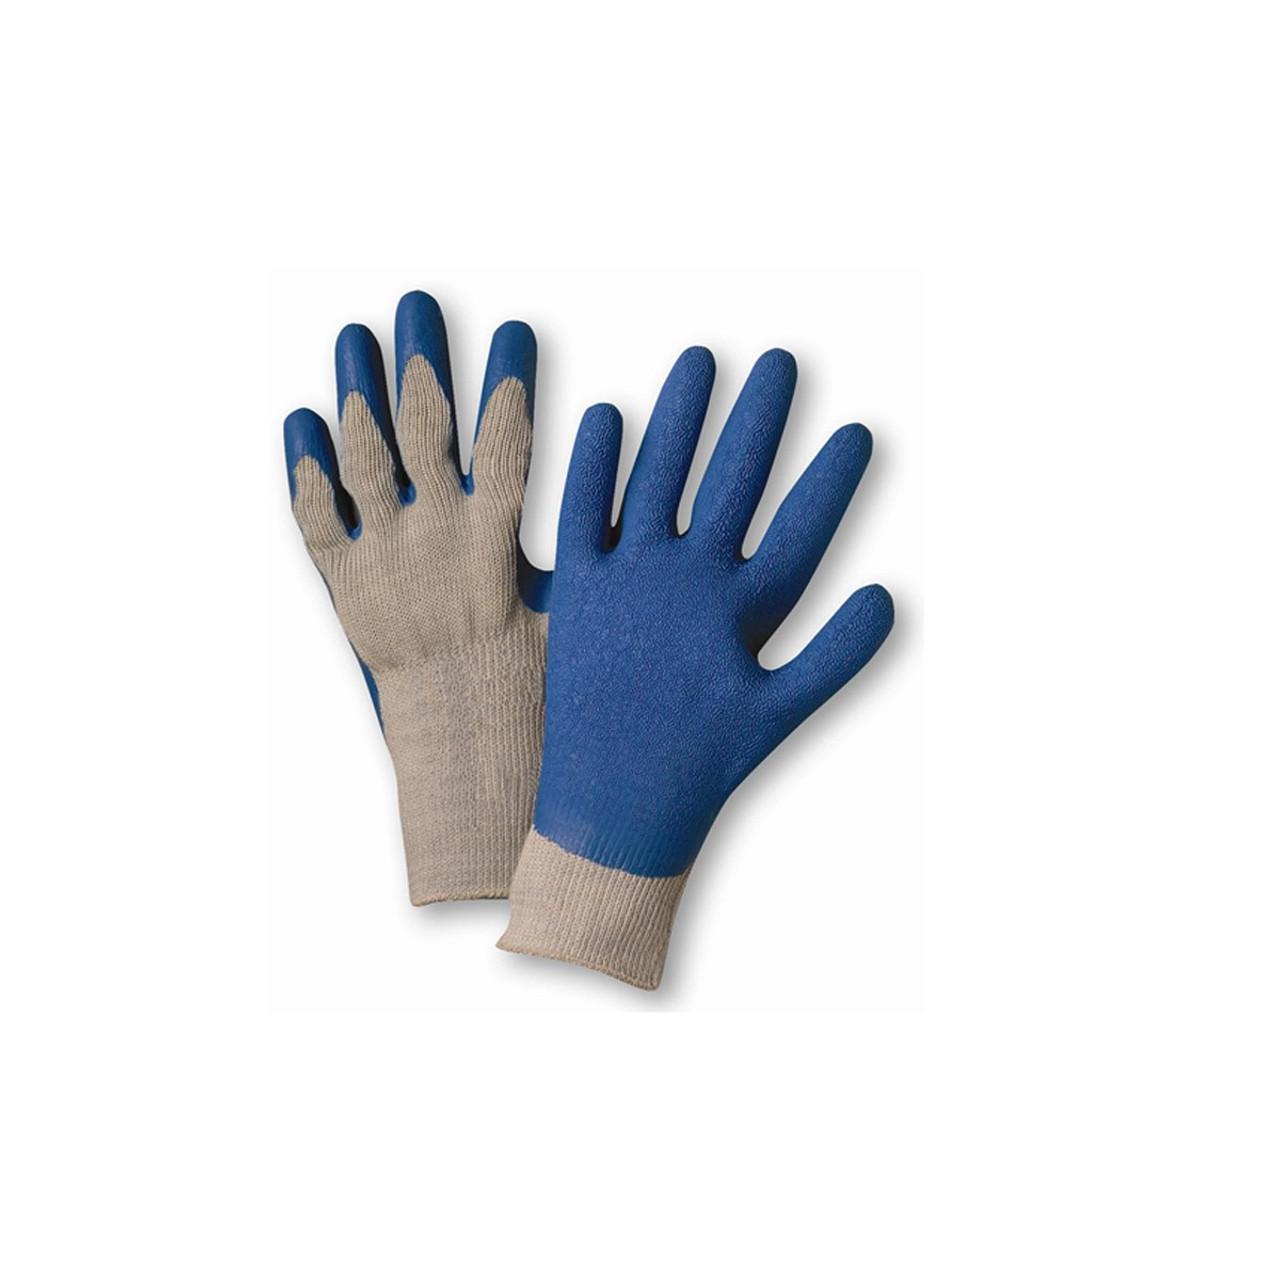 Case of Gloves - Black/Blue Latex Palm Coated - 12 Dozen